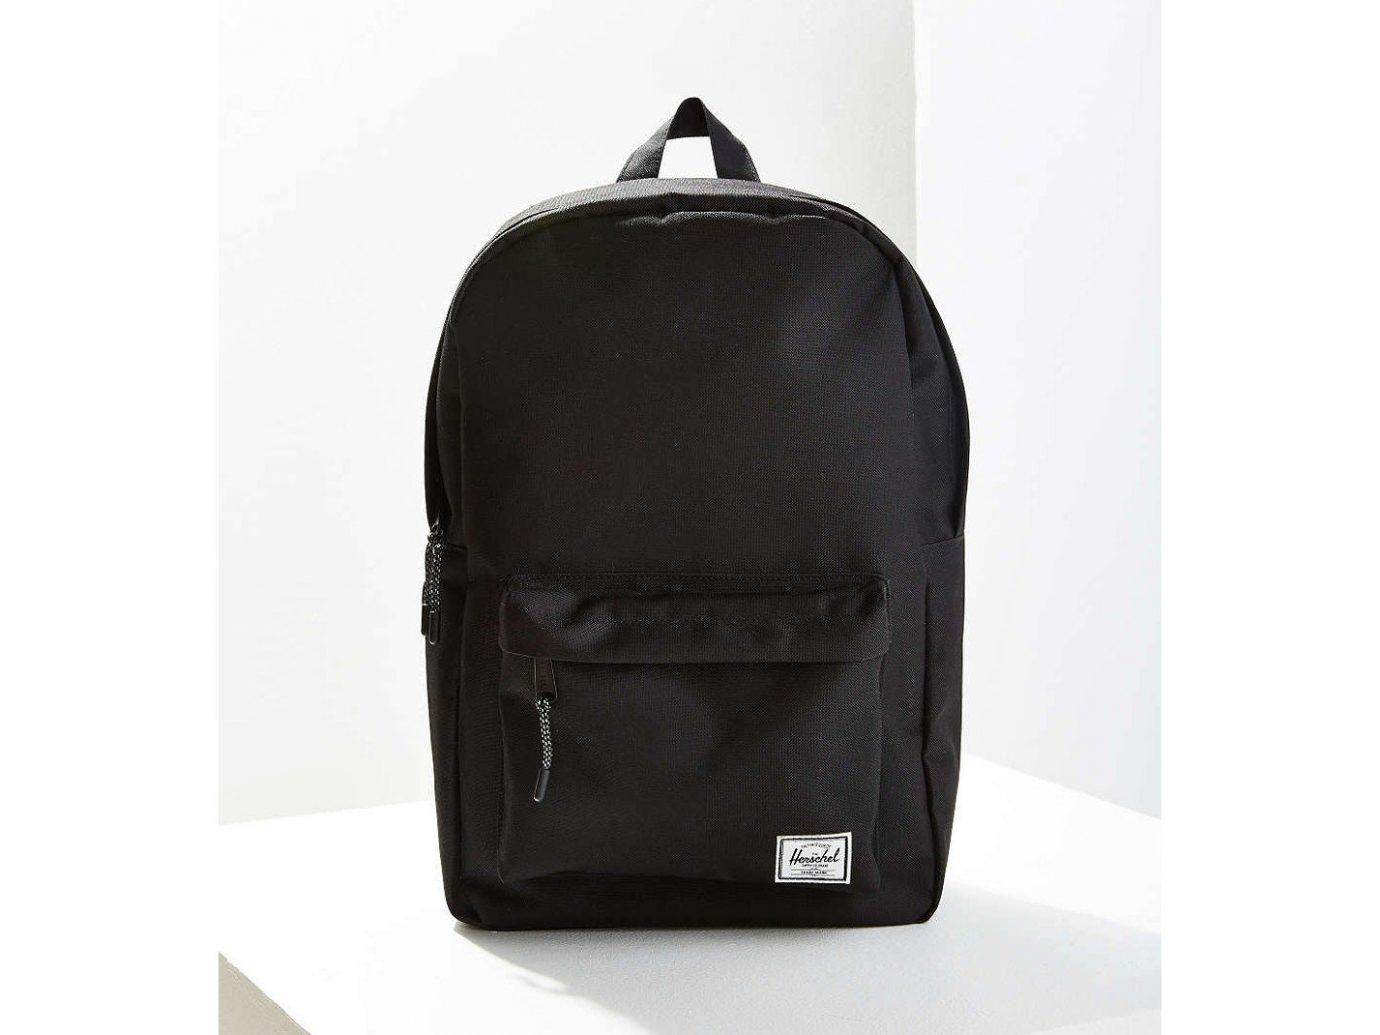 Style + Design suitcase luggage black bag sitting case product accessory backpack product design luggage & bags brand handbag